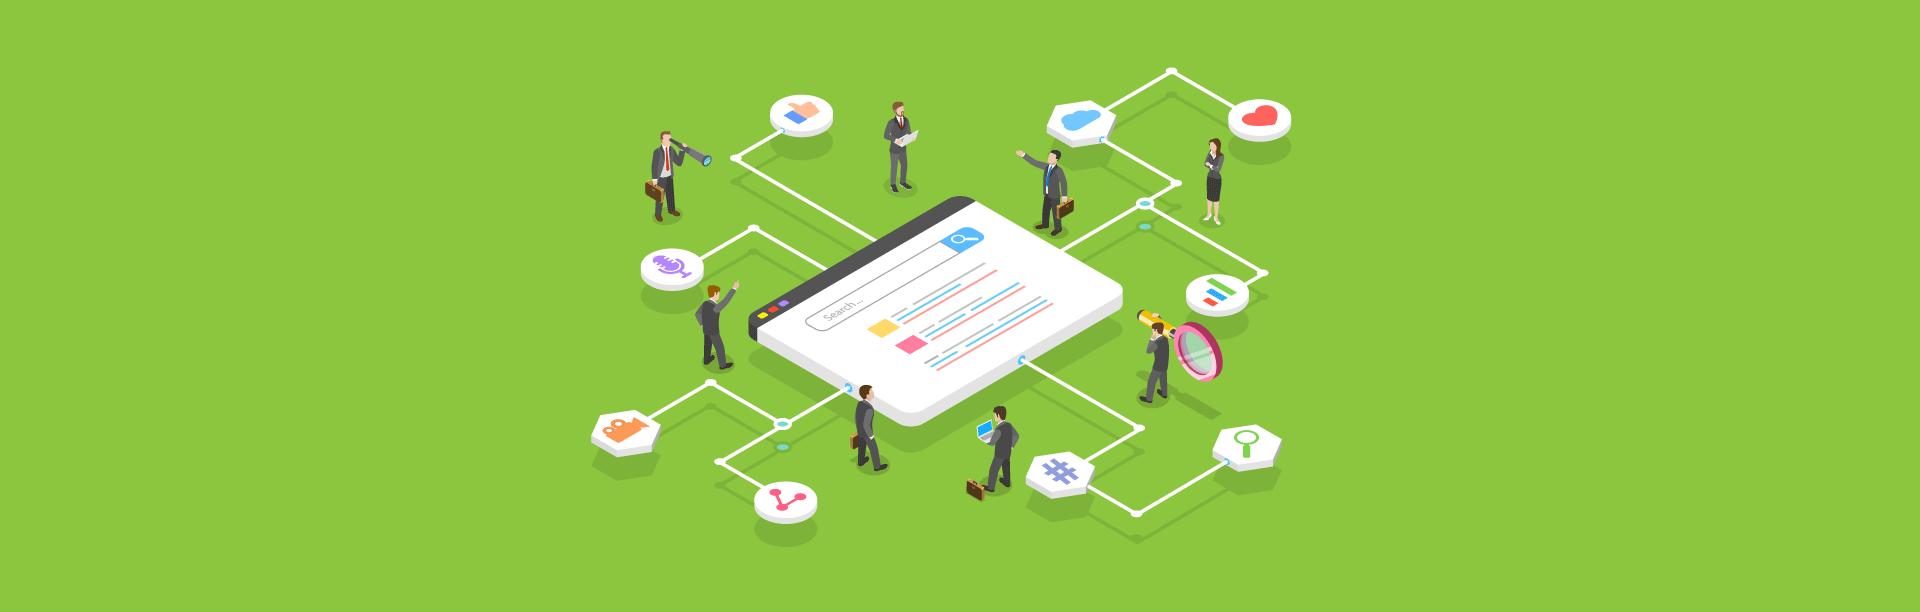 A Detailed Case Study on Microsoft Access Modernization Roadmap